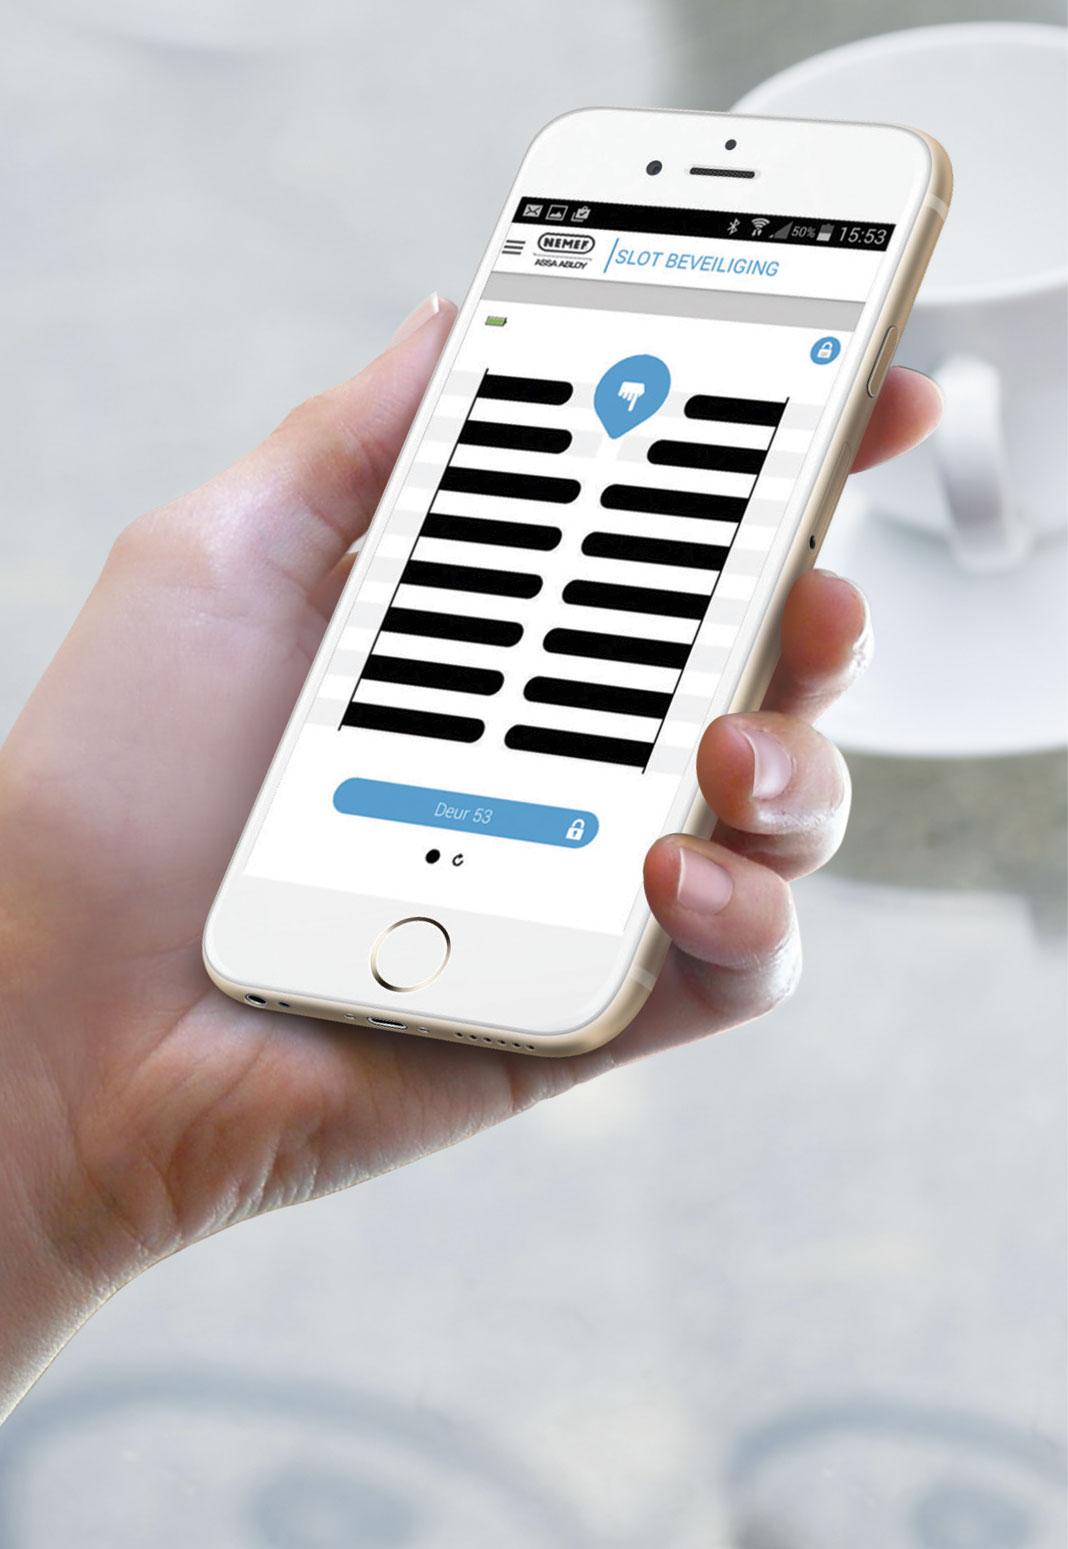 Sfeerimpressie Nemef ENTR smartphone app.jpg